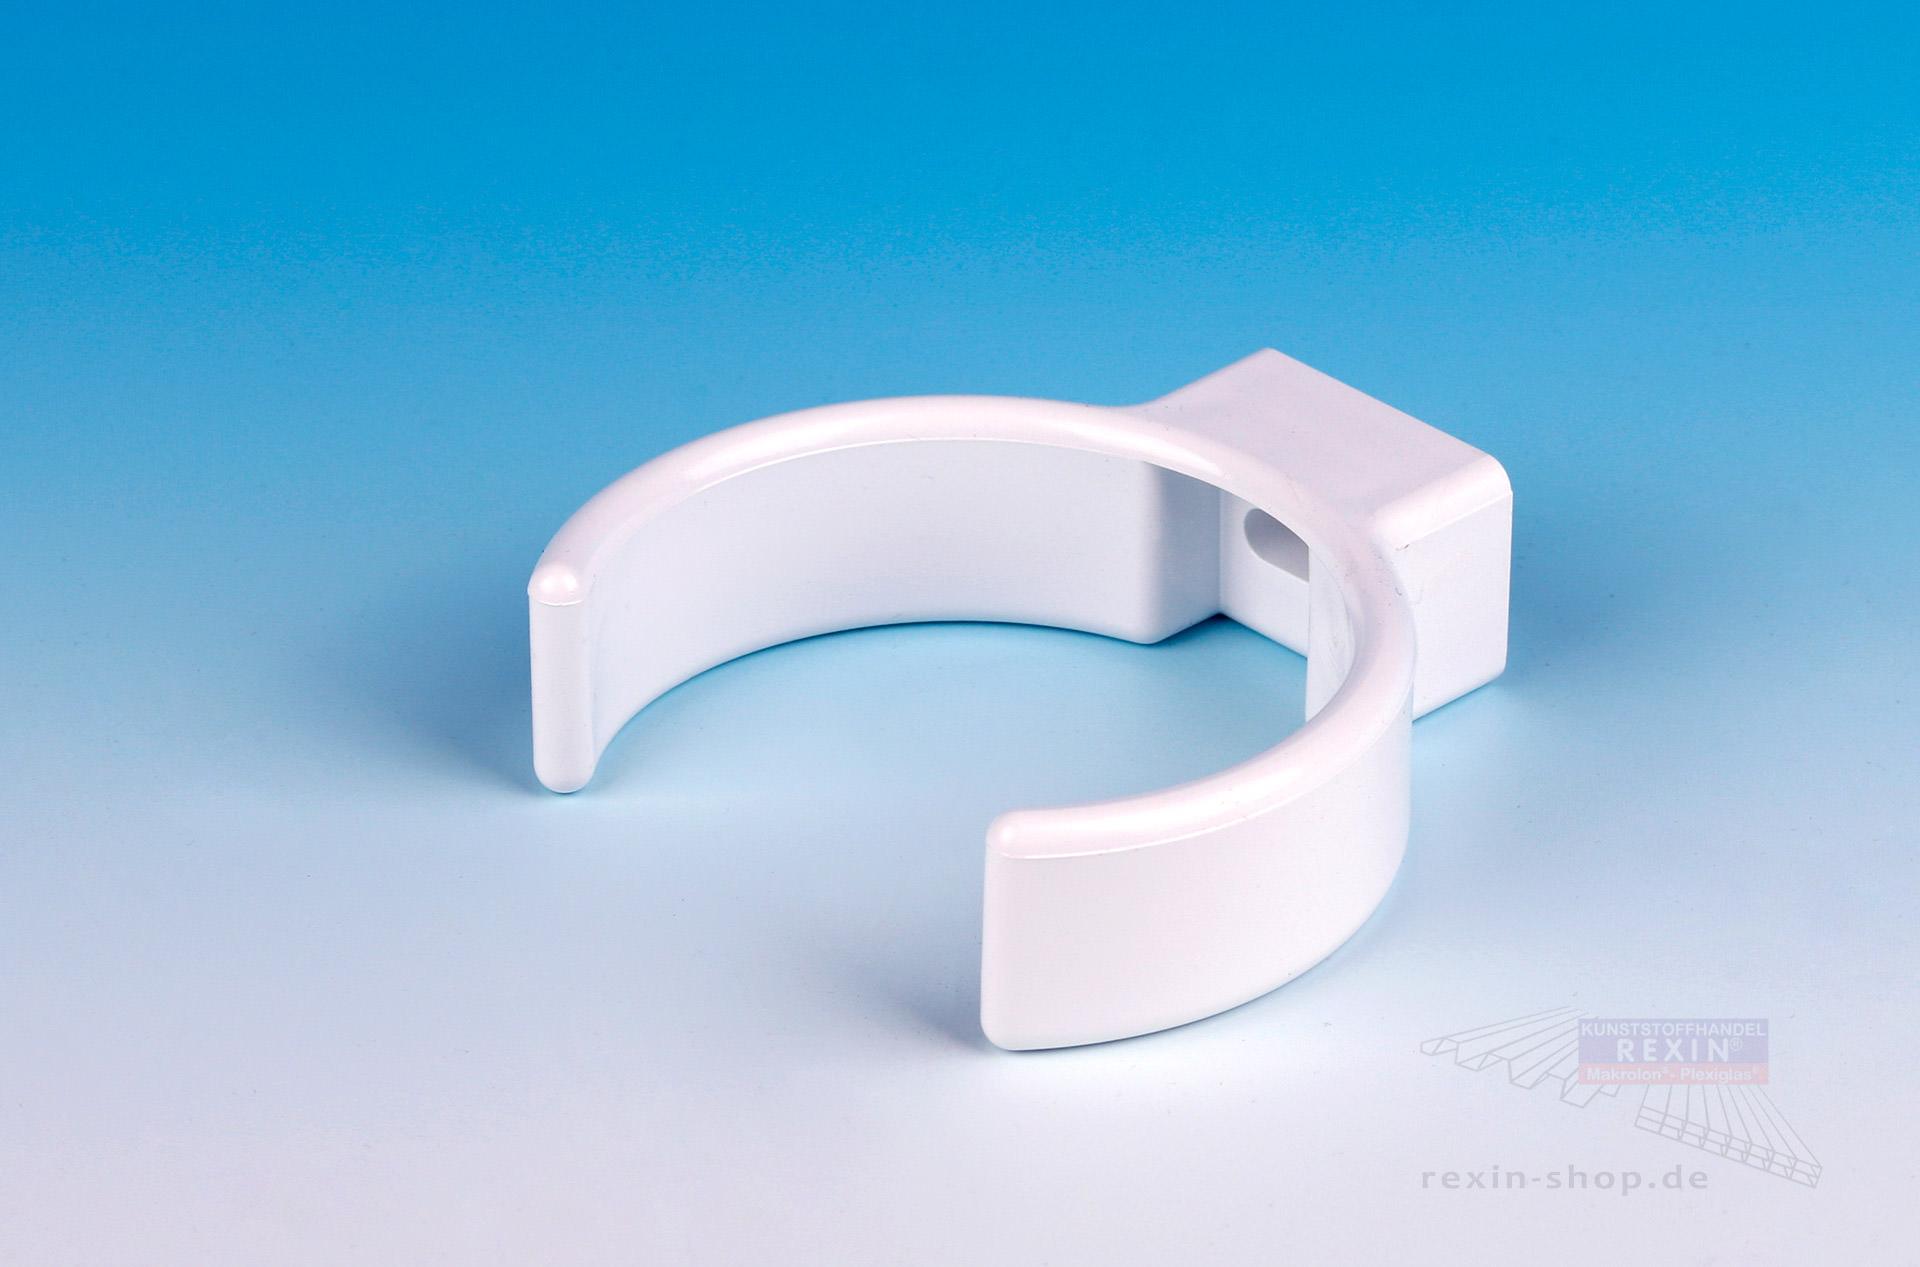 kunststoff rohrschelle clip wei kunststoff rohrschelle clip wei rexin shop. Black Bedroom Furniture Sets. Home Design Ideas